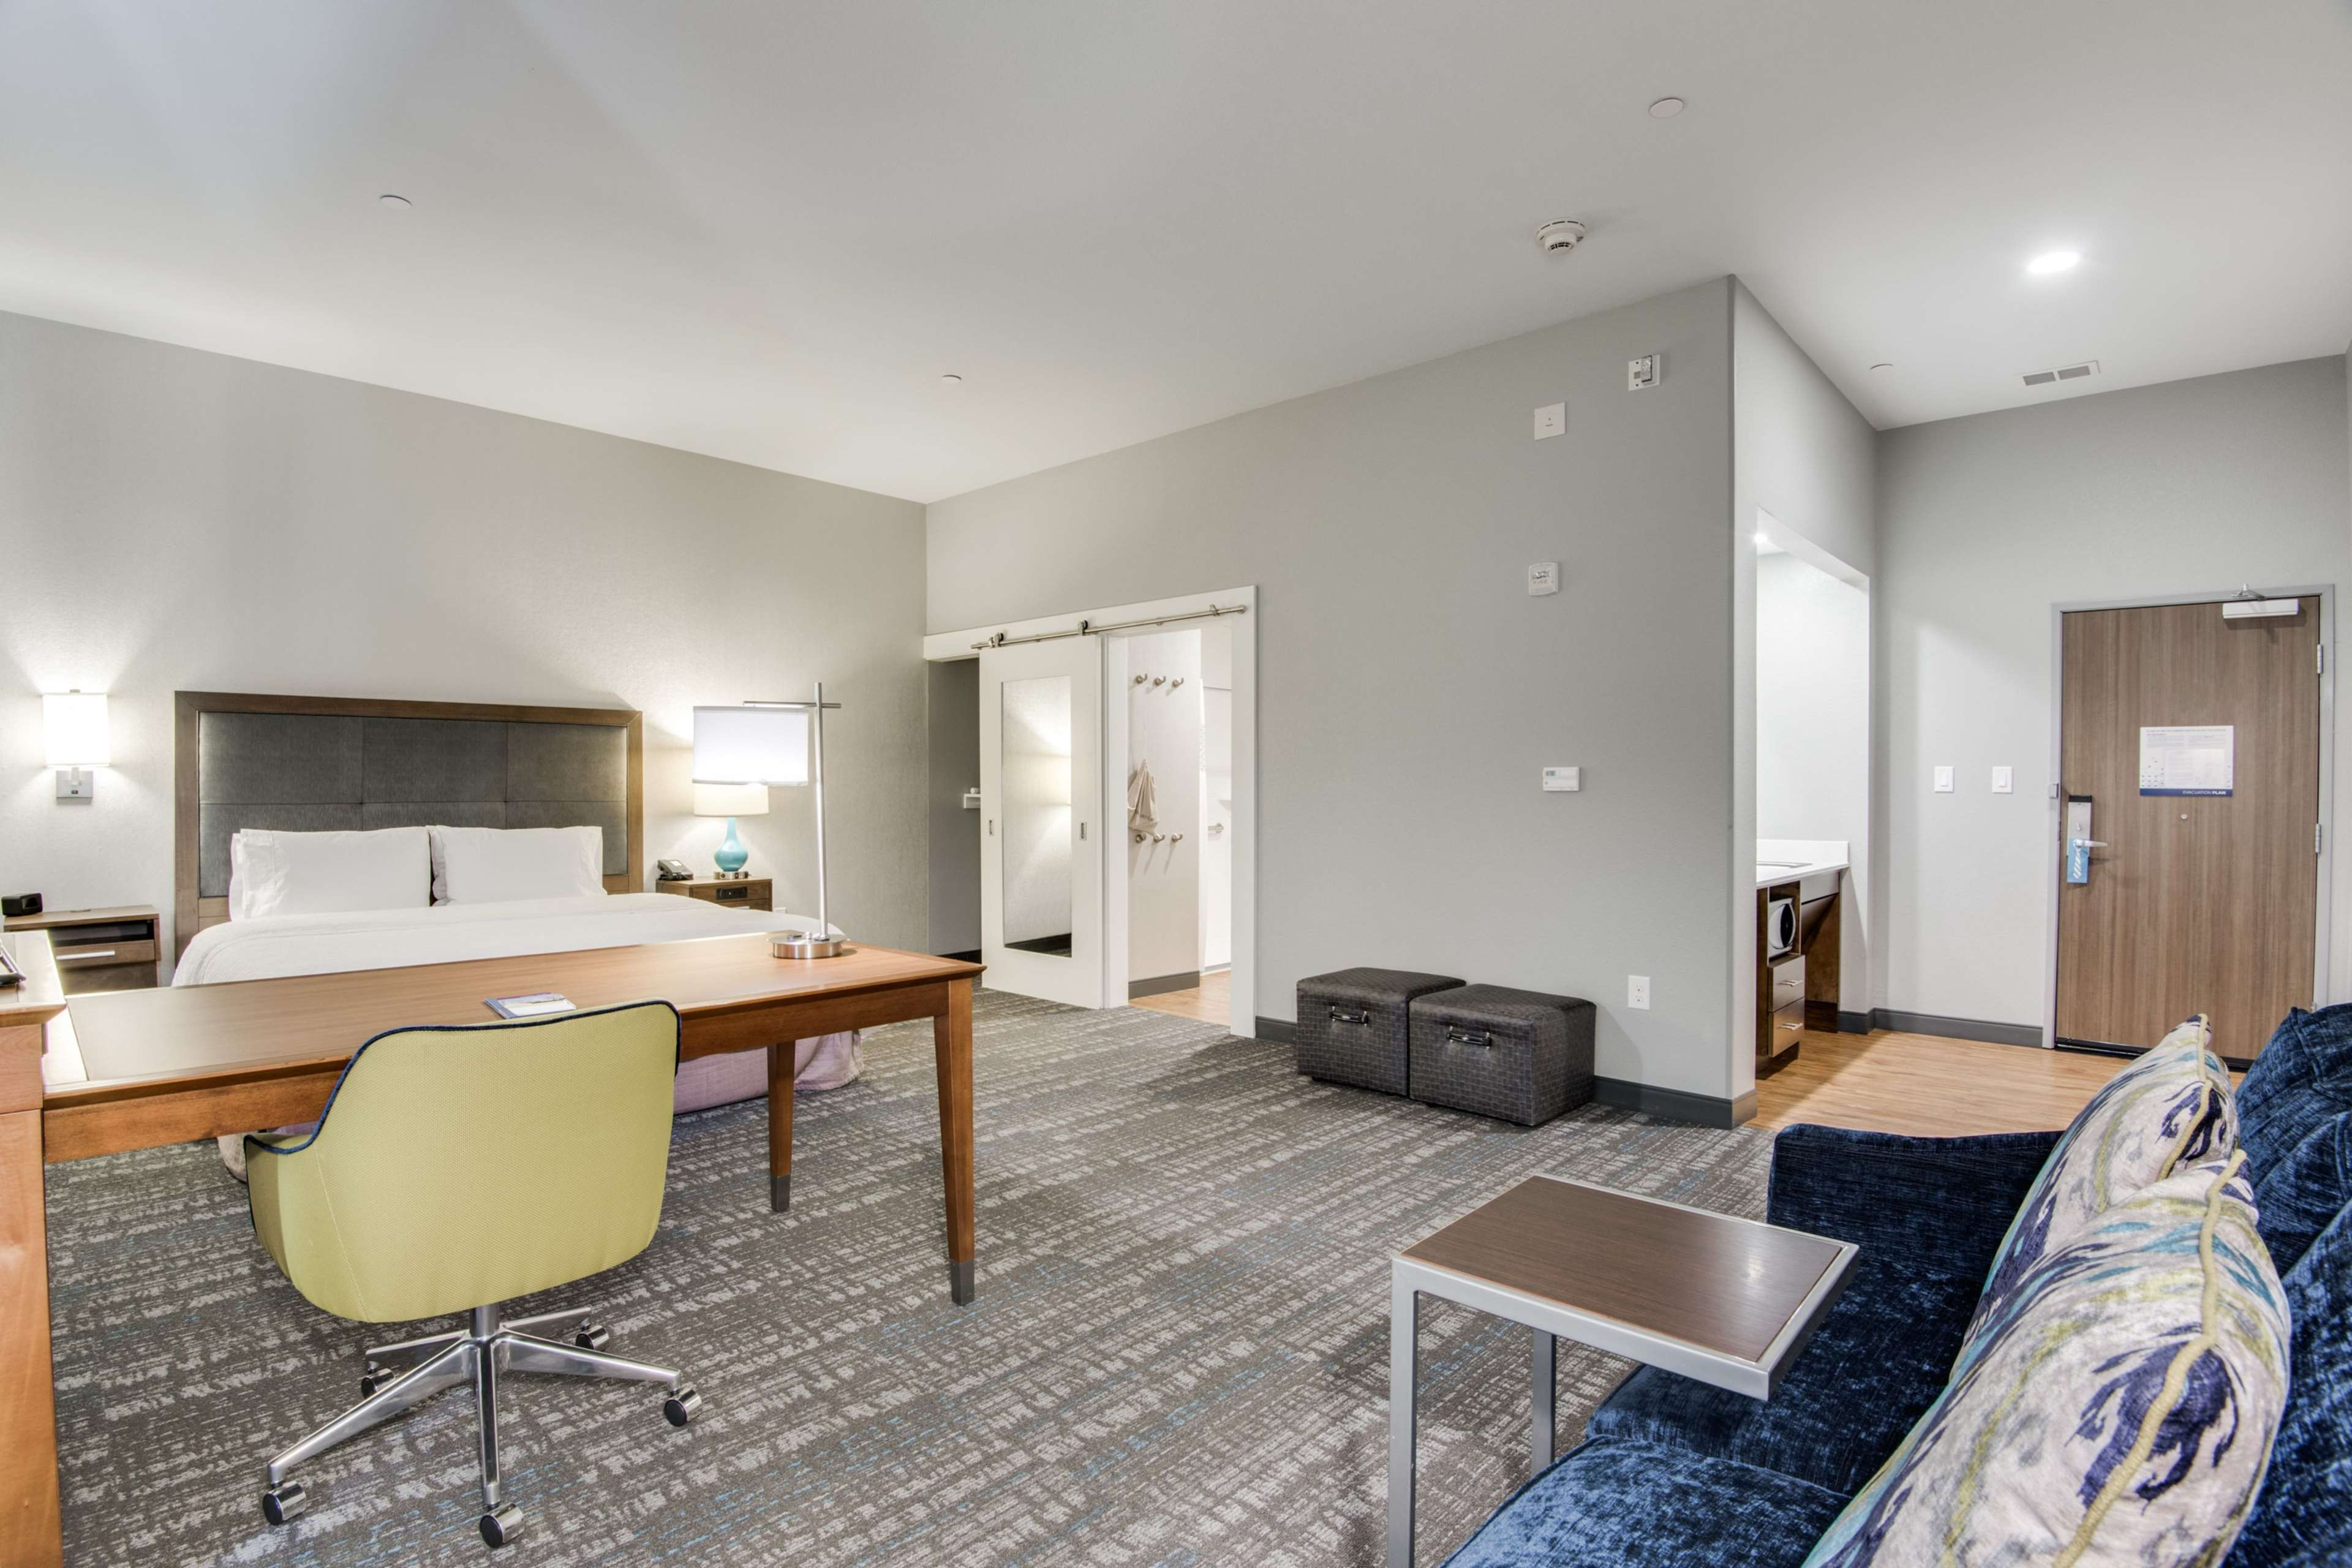 Hampton Inn & Suites Dallas/Ft. Worth Airport South image 22